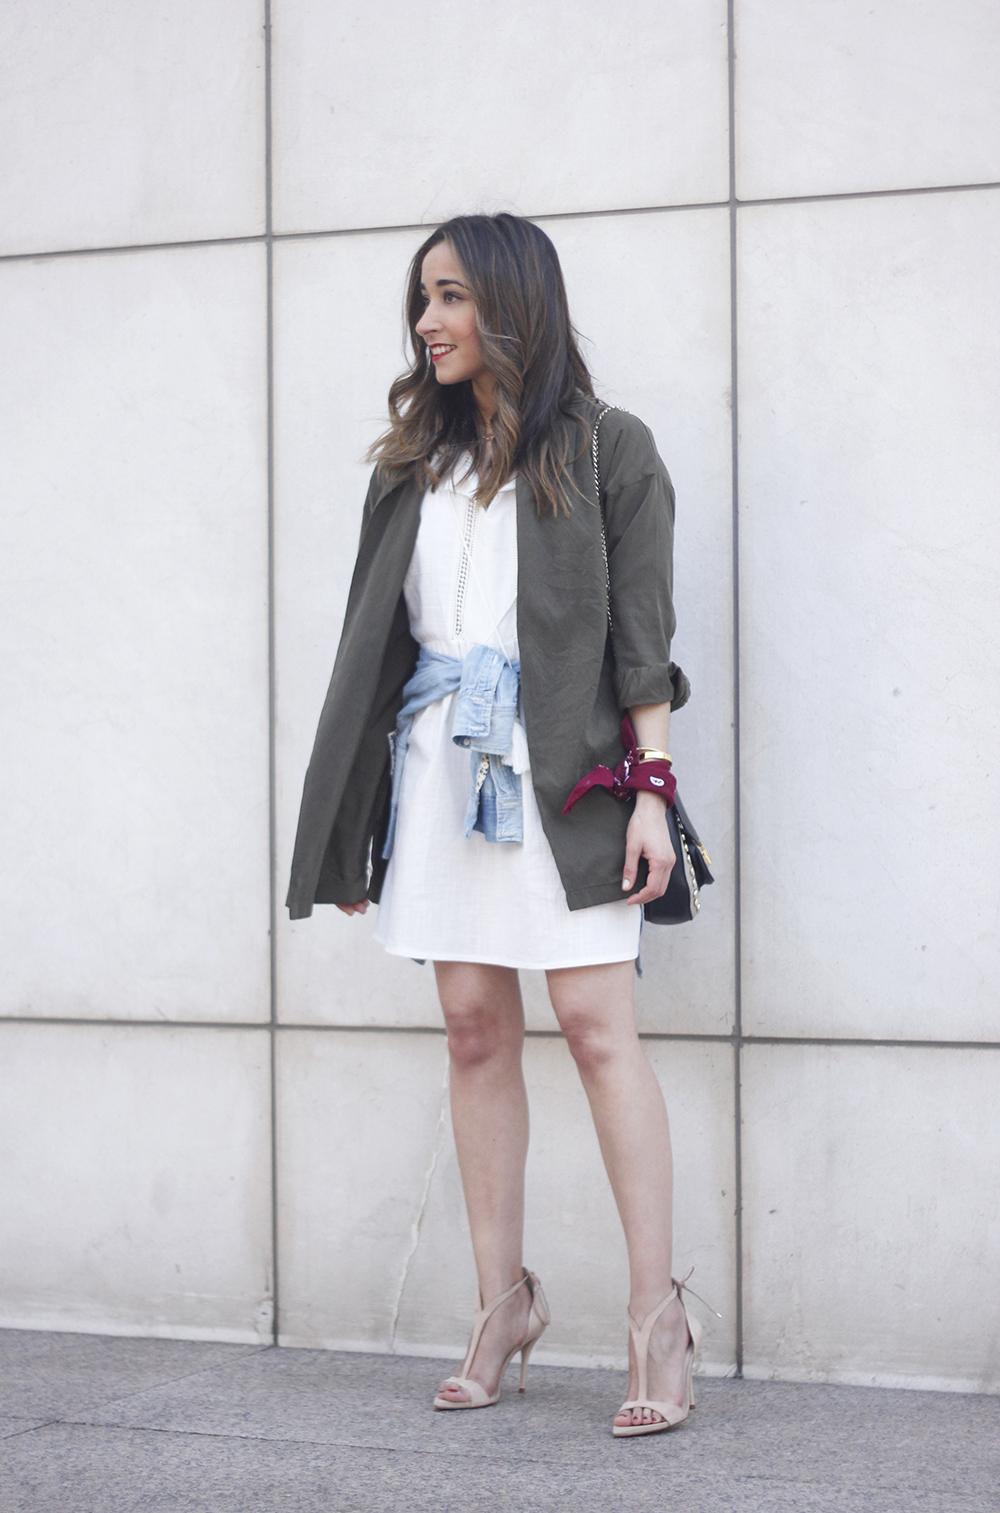 White Dress khaki shirt denim shirt nude sandals bandana outfit spring style02